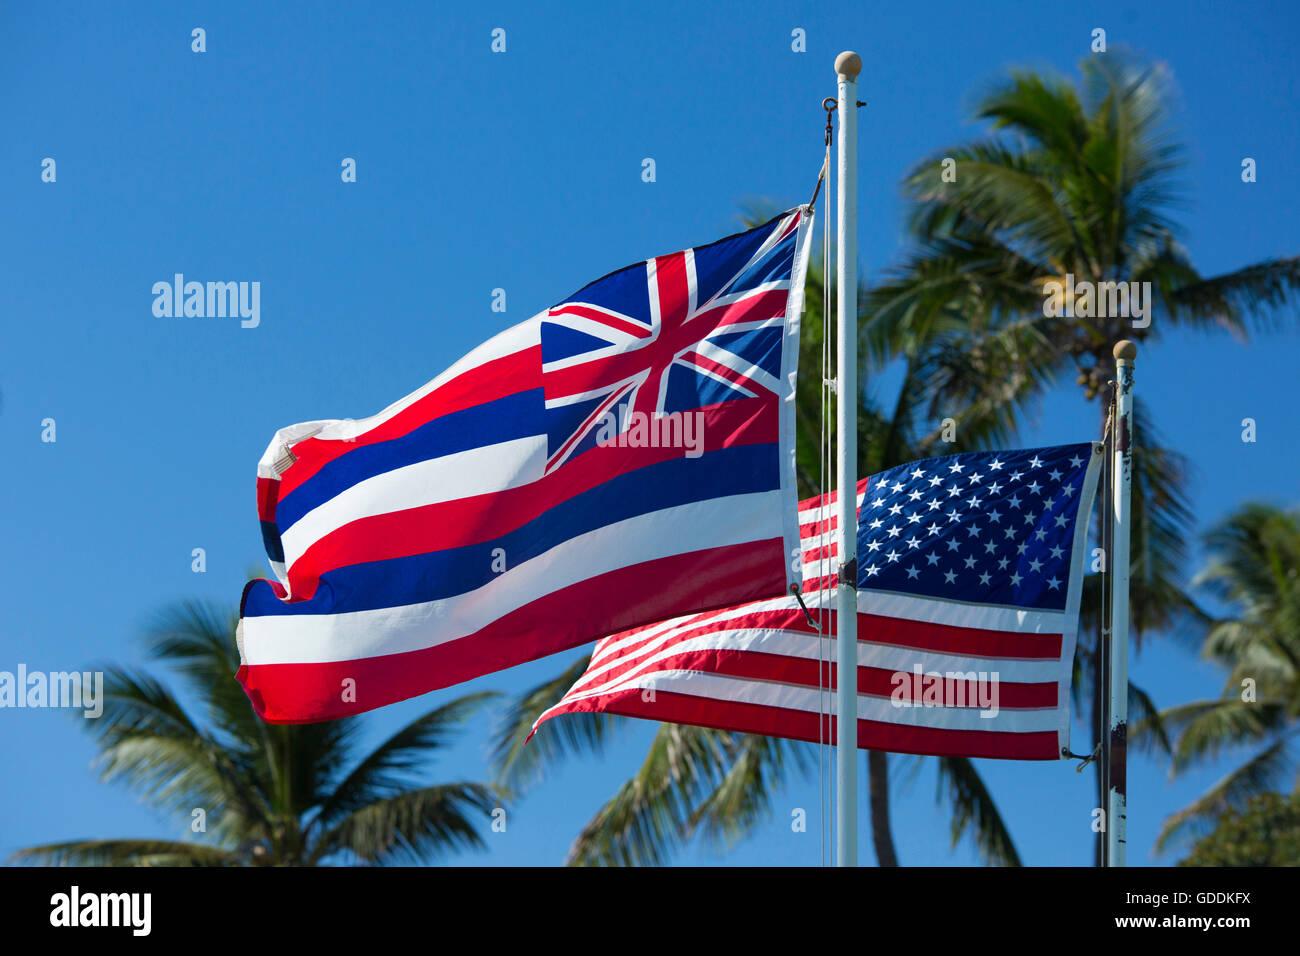 Maui, US-Flagge, Banner, USA, Hawaii, Amerika, Flagge, Flaggen, Palmen, Stockbild